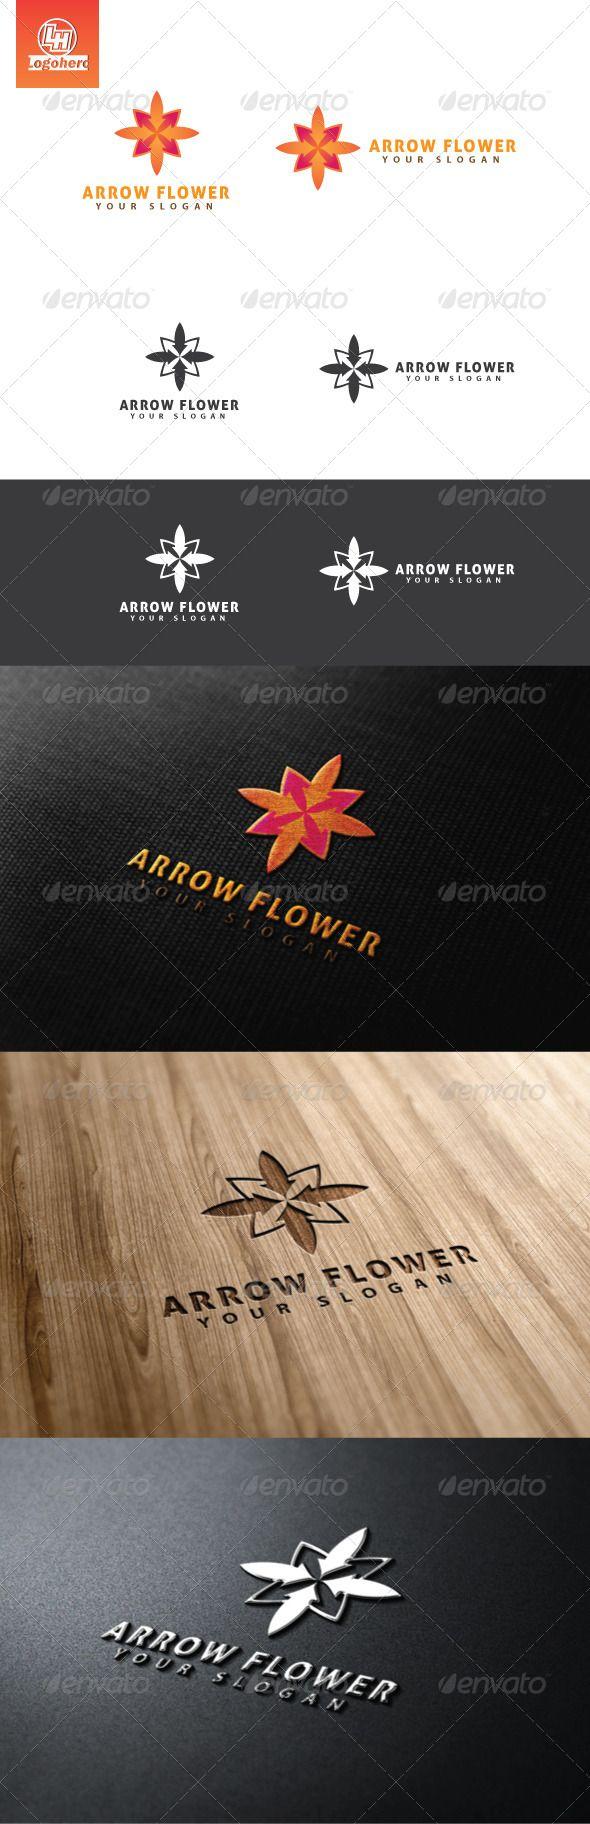 Arrow Flower Logo Template Vector FormatLetter LogoOffice